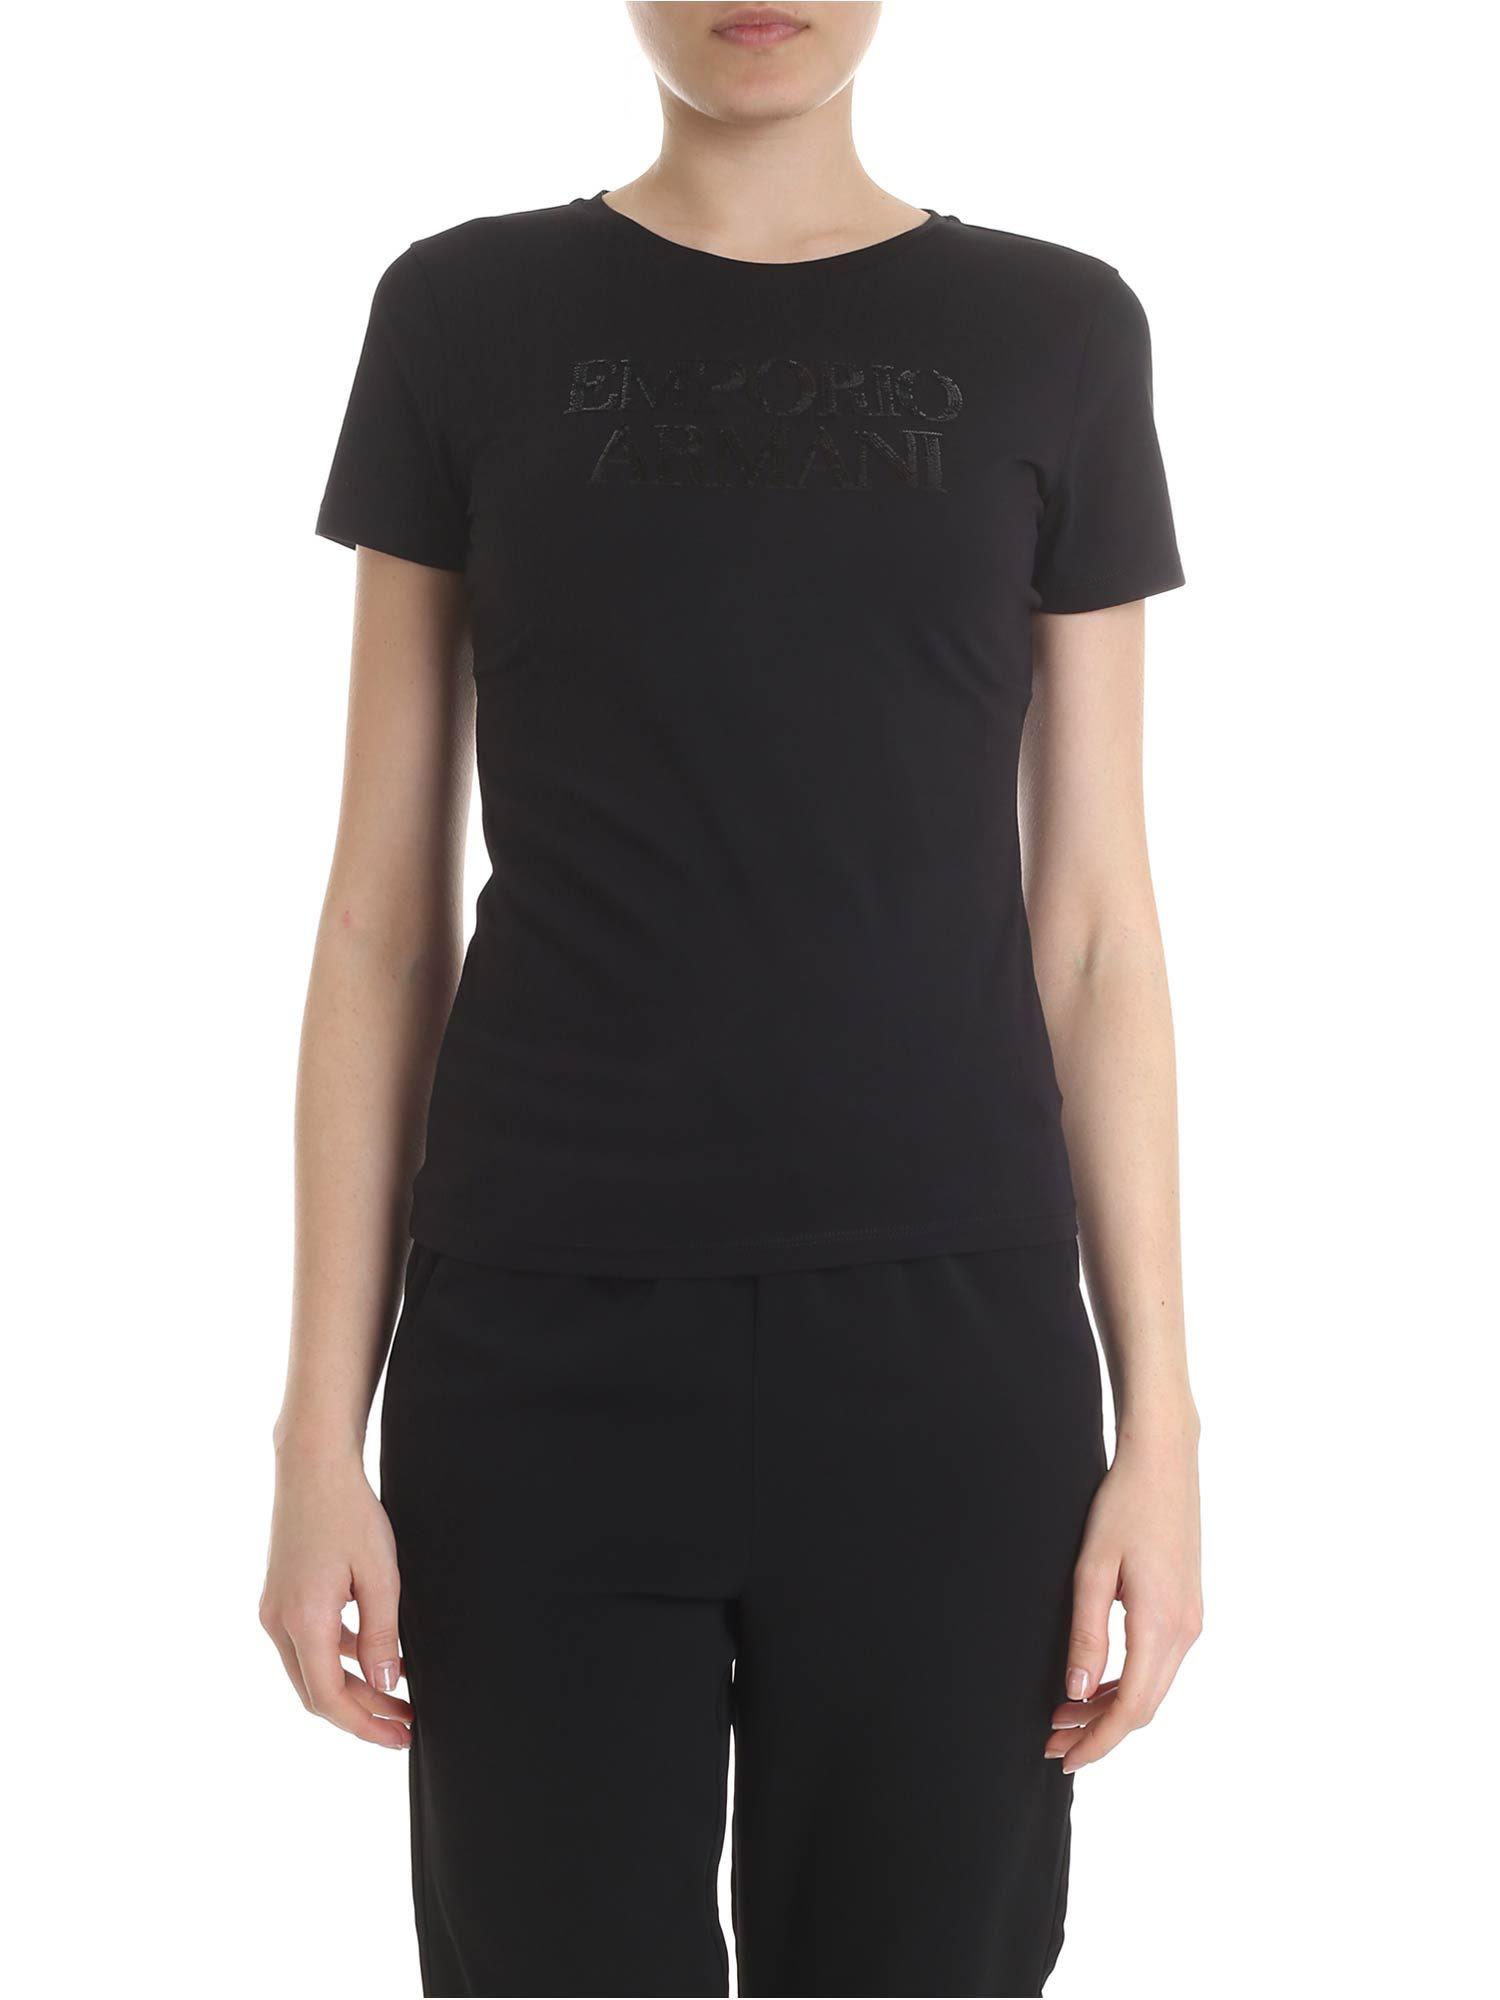 7ae59e723 Emporio Armani Emporio Armani Logo Embellished T-shirt - Black ...